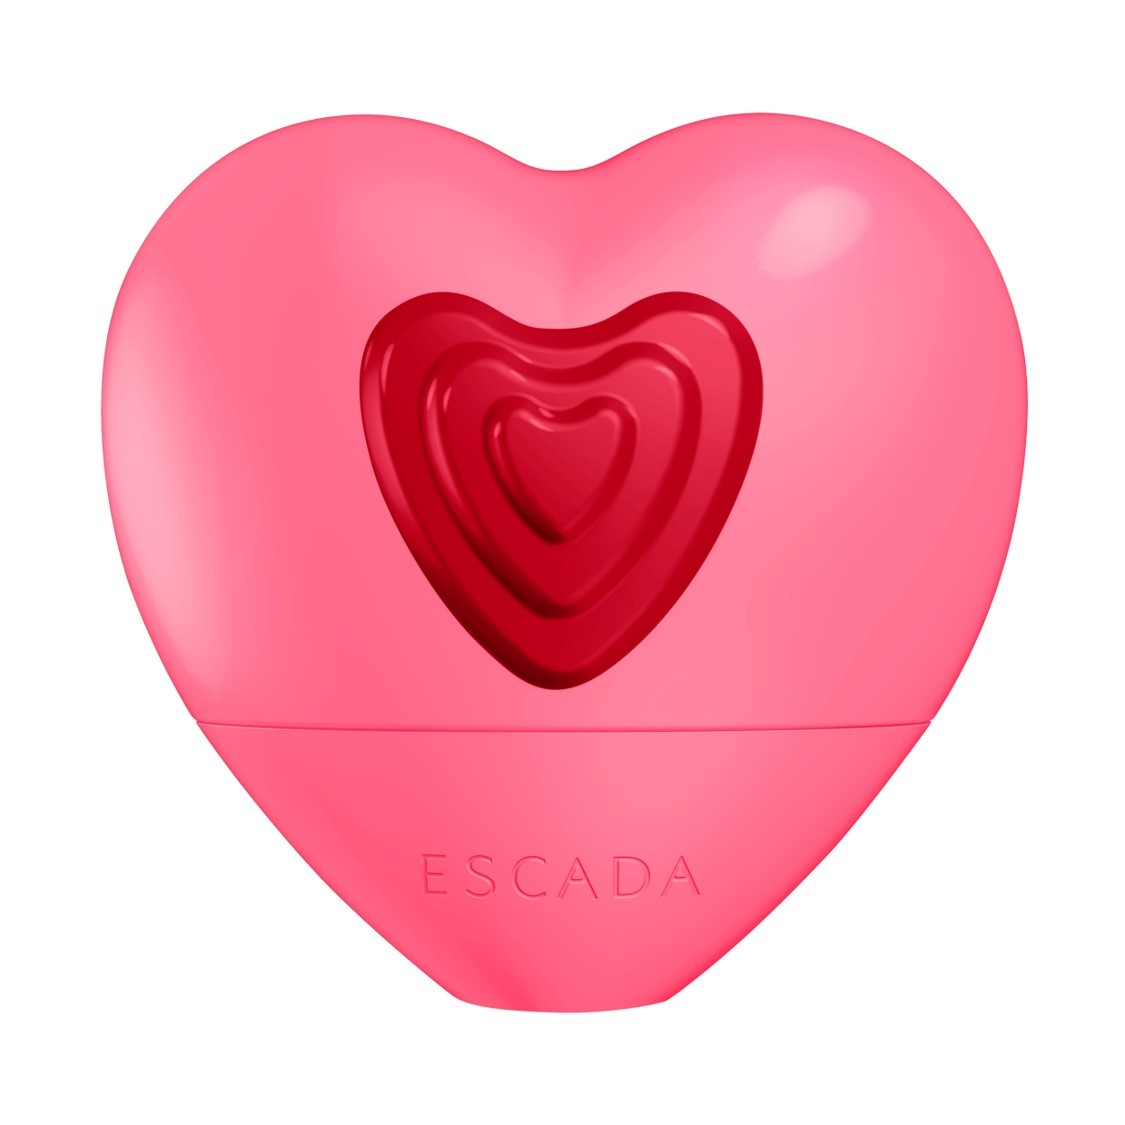 Escada - Candy Love Eau de Toilette -  100 ml